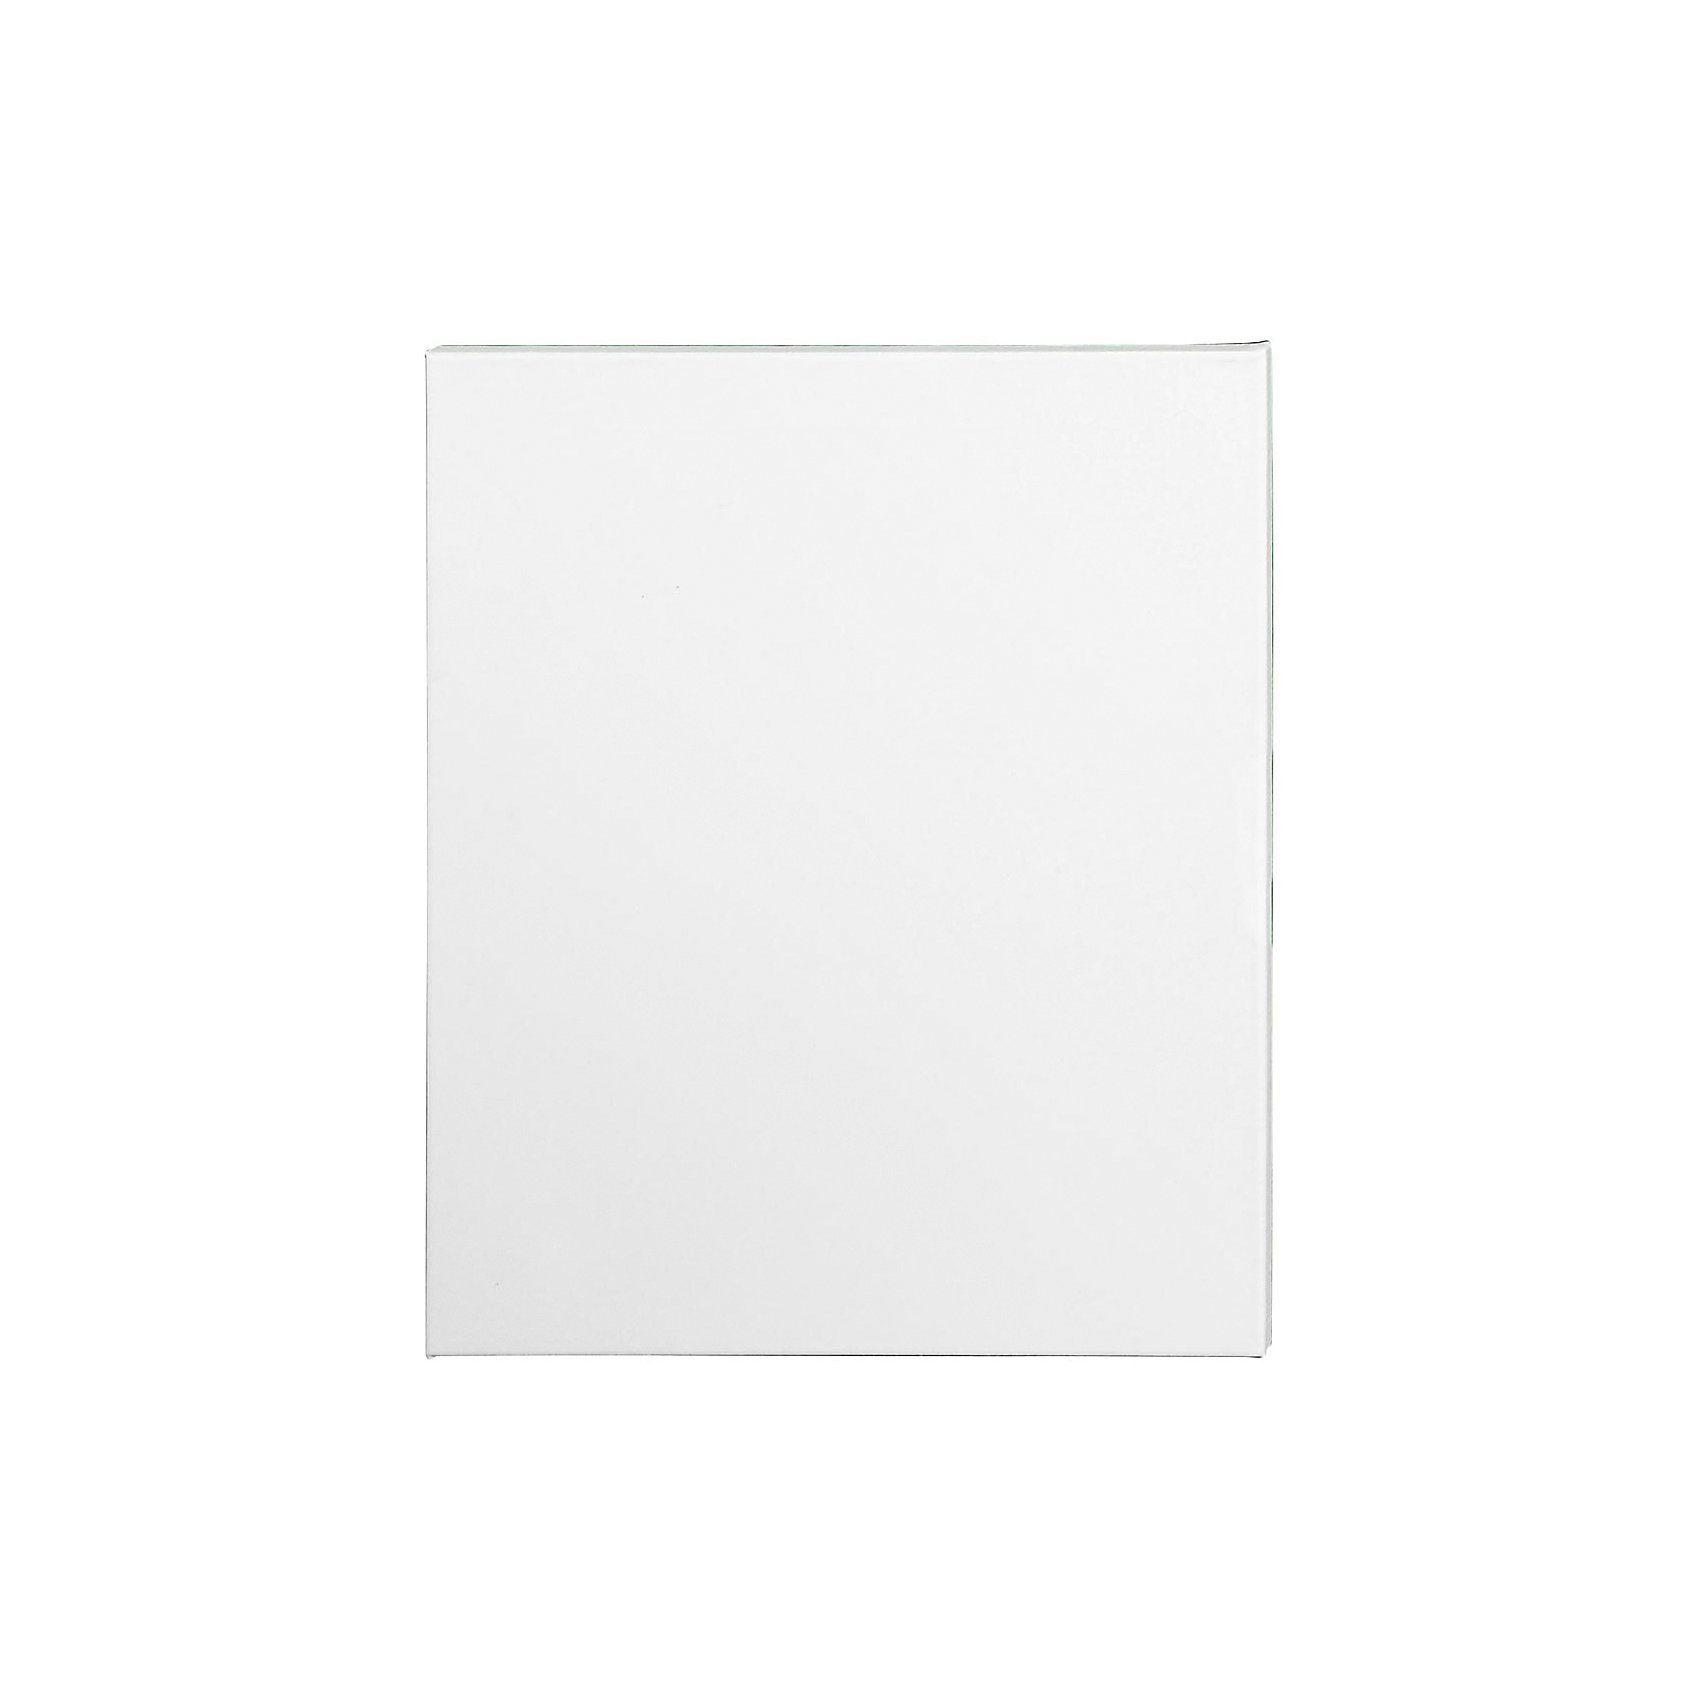 Keilrahmen, Größe 50x60 cm, Tiefe 1,6 cm, 5 Stück